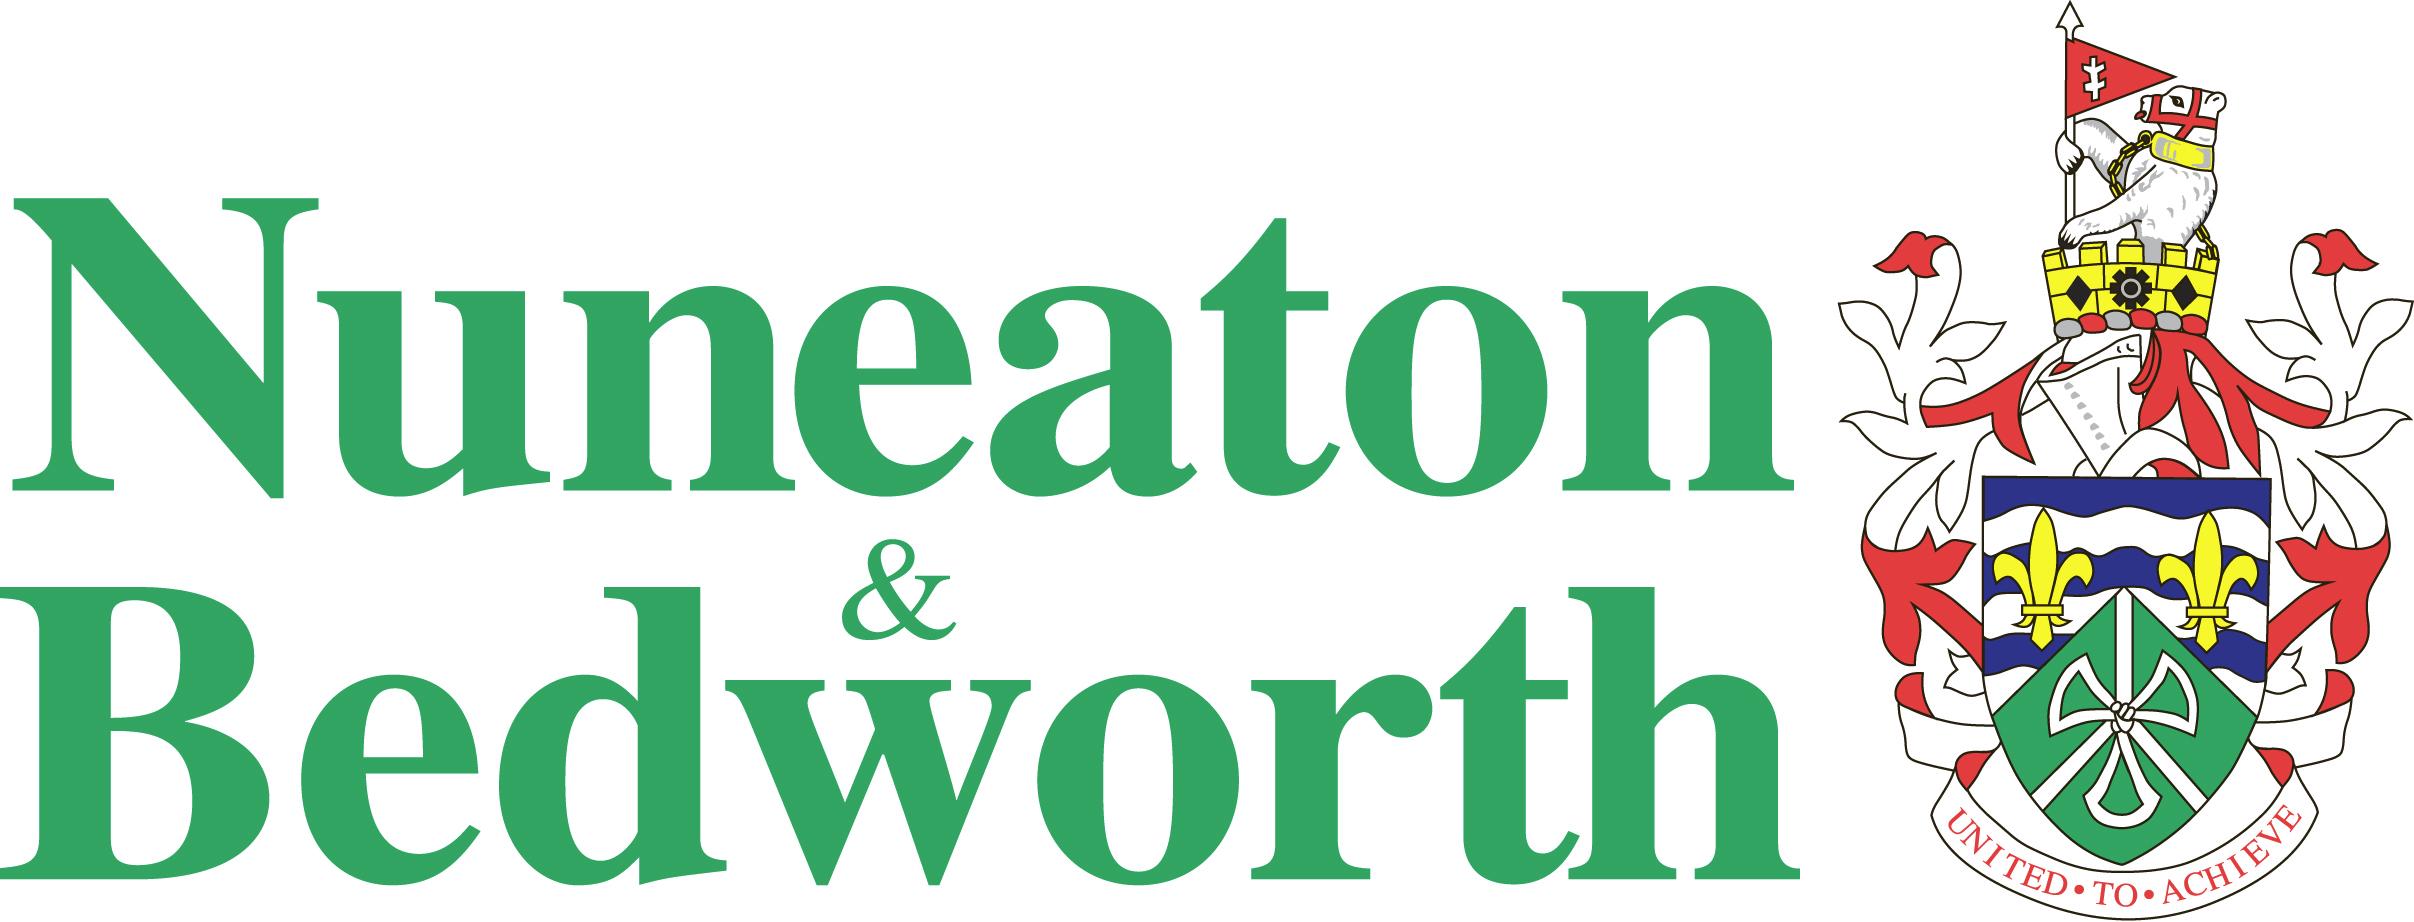 Nuneaton and Bedworth, Chalmor energy saving for councils